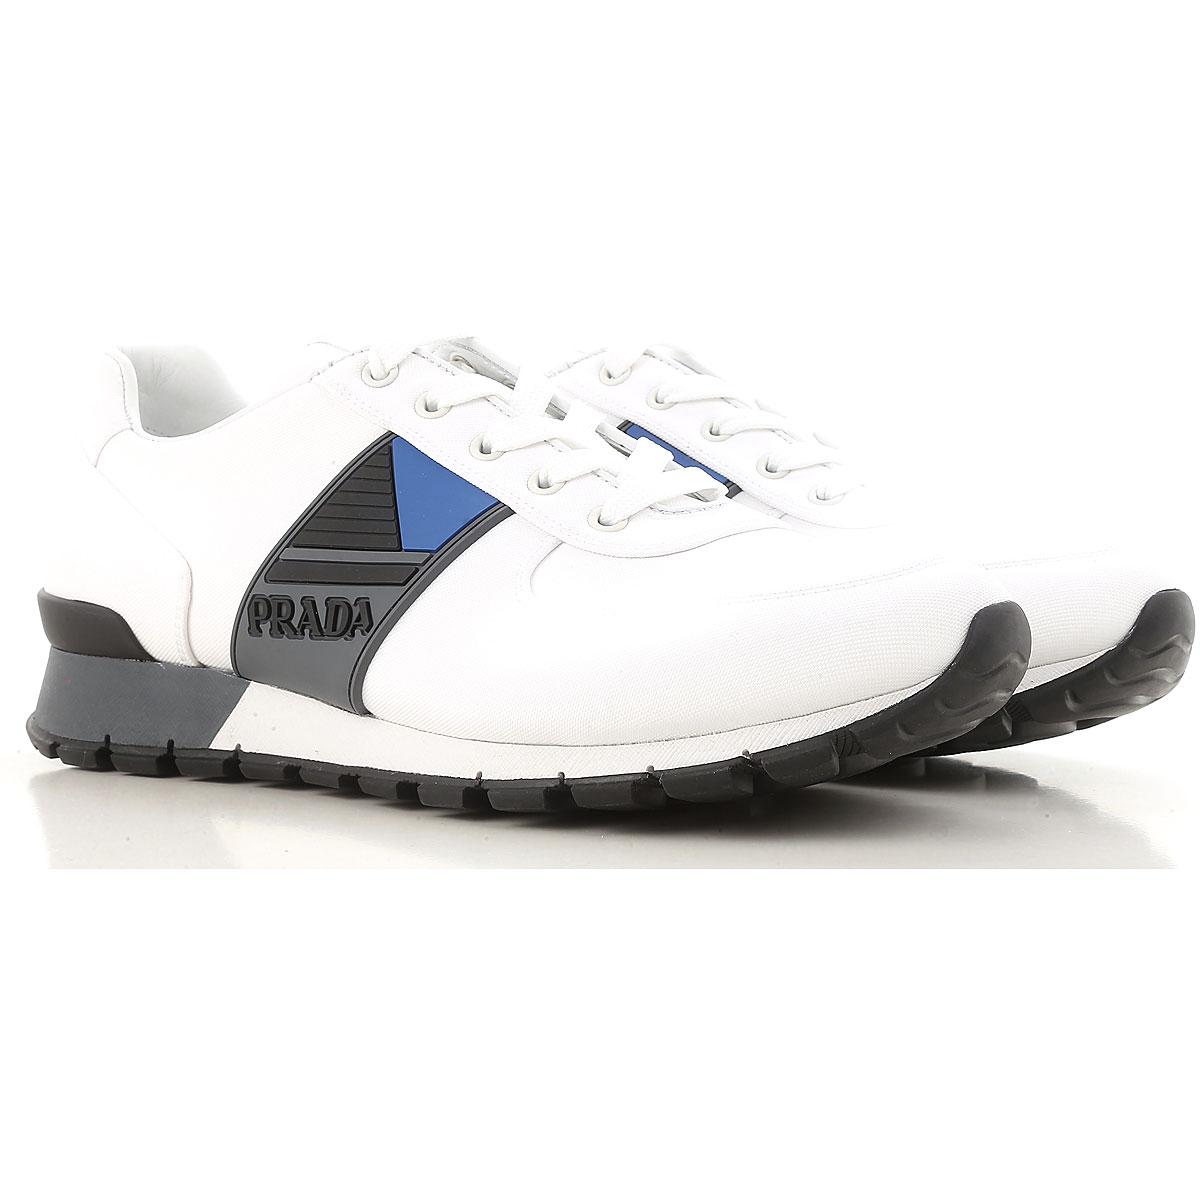 0q6 Code4e3198 PradaStyle Mens F0009 Shoes Qtshdr